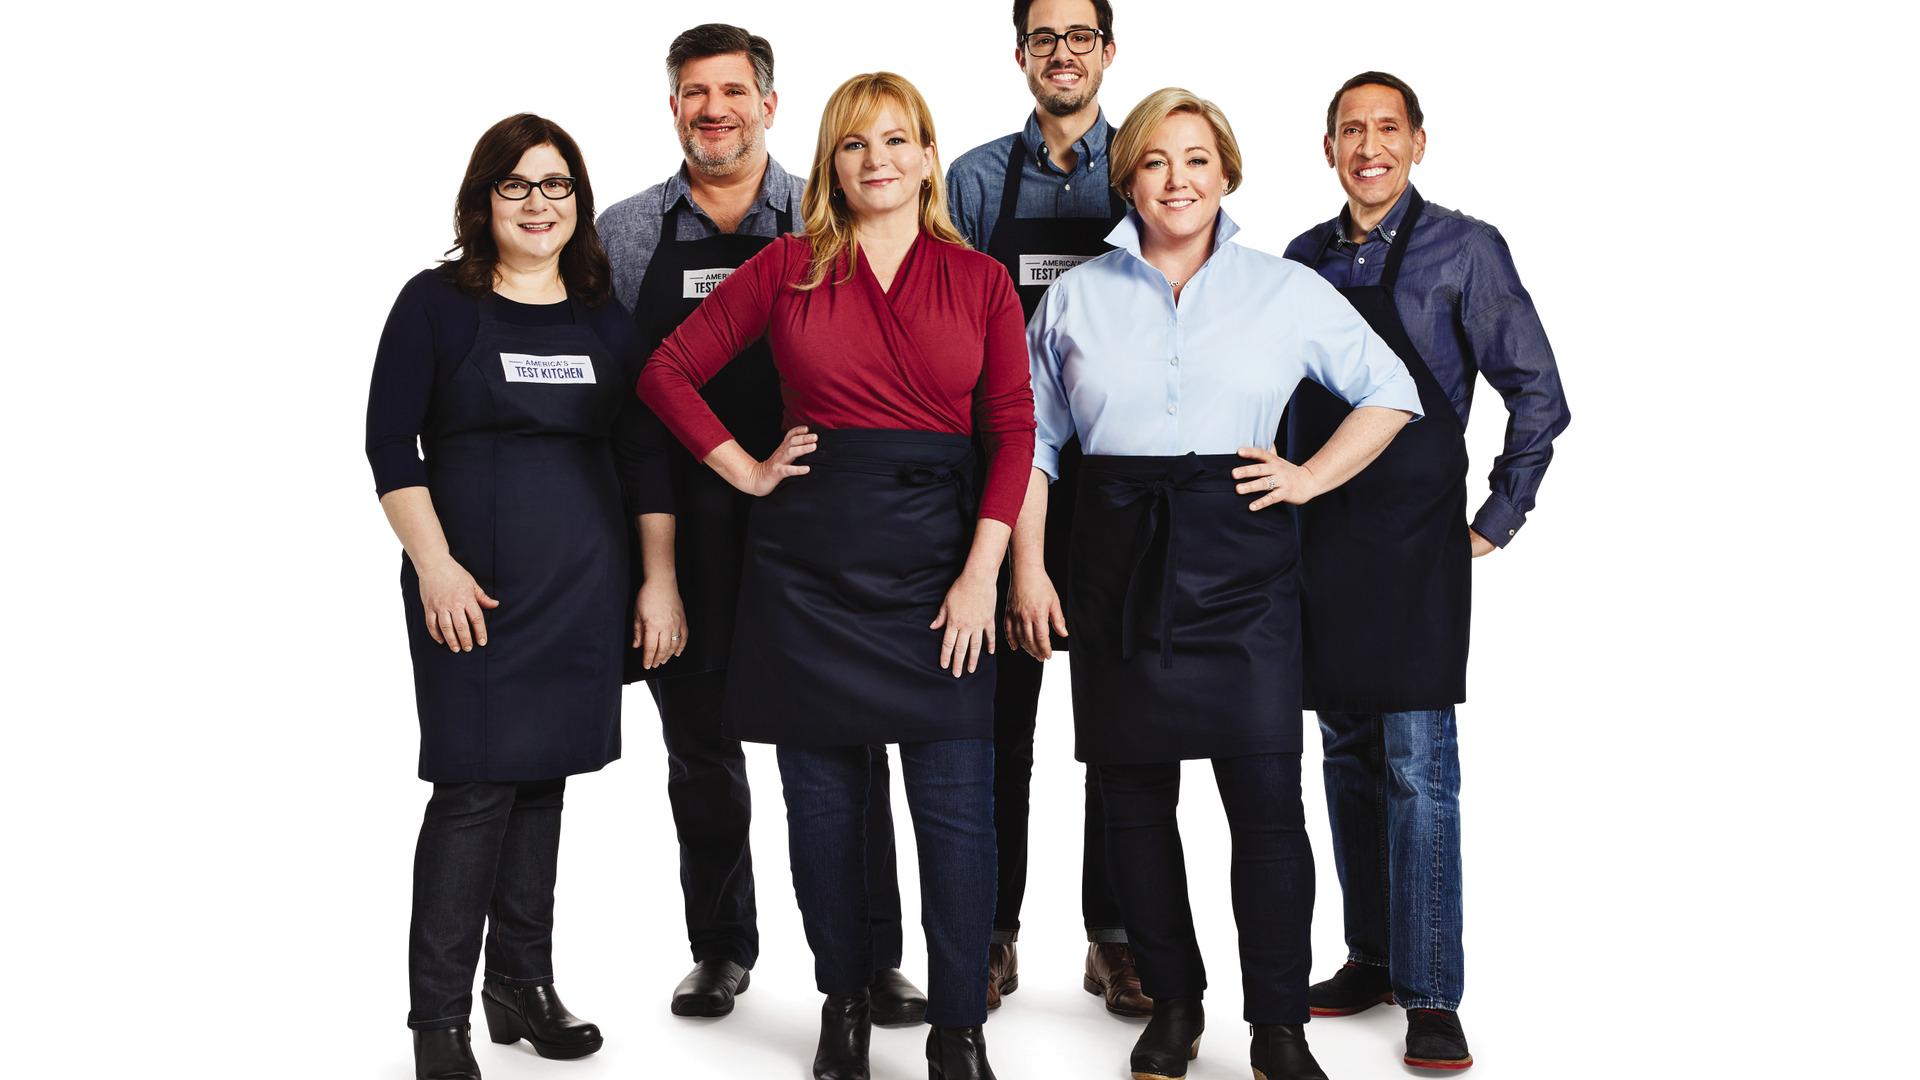 Show America's Test Kitchen